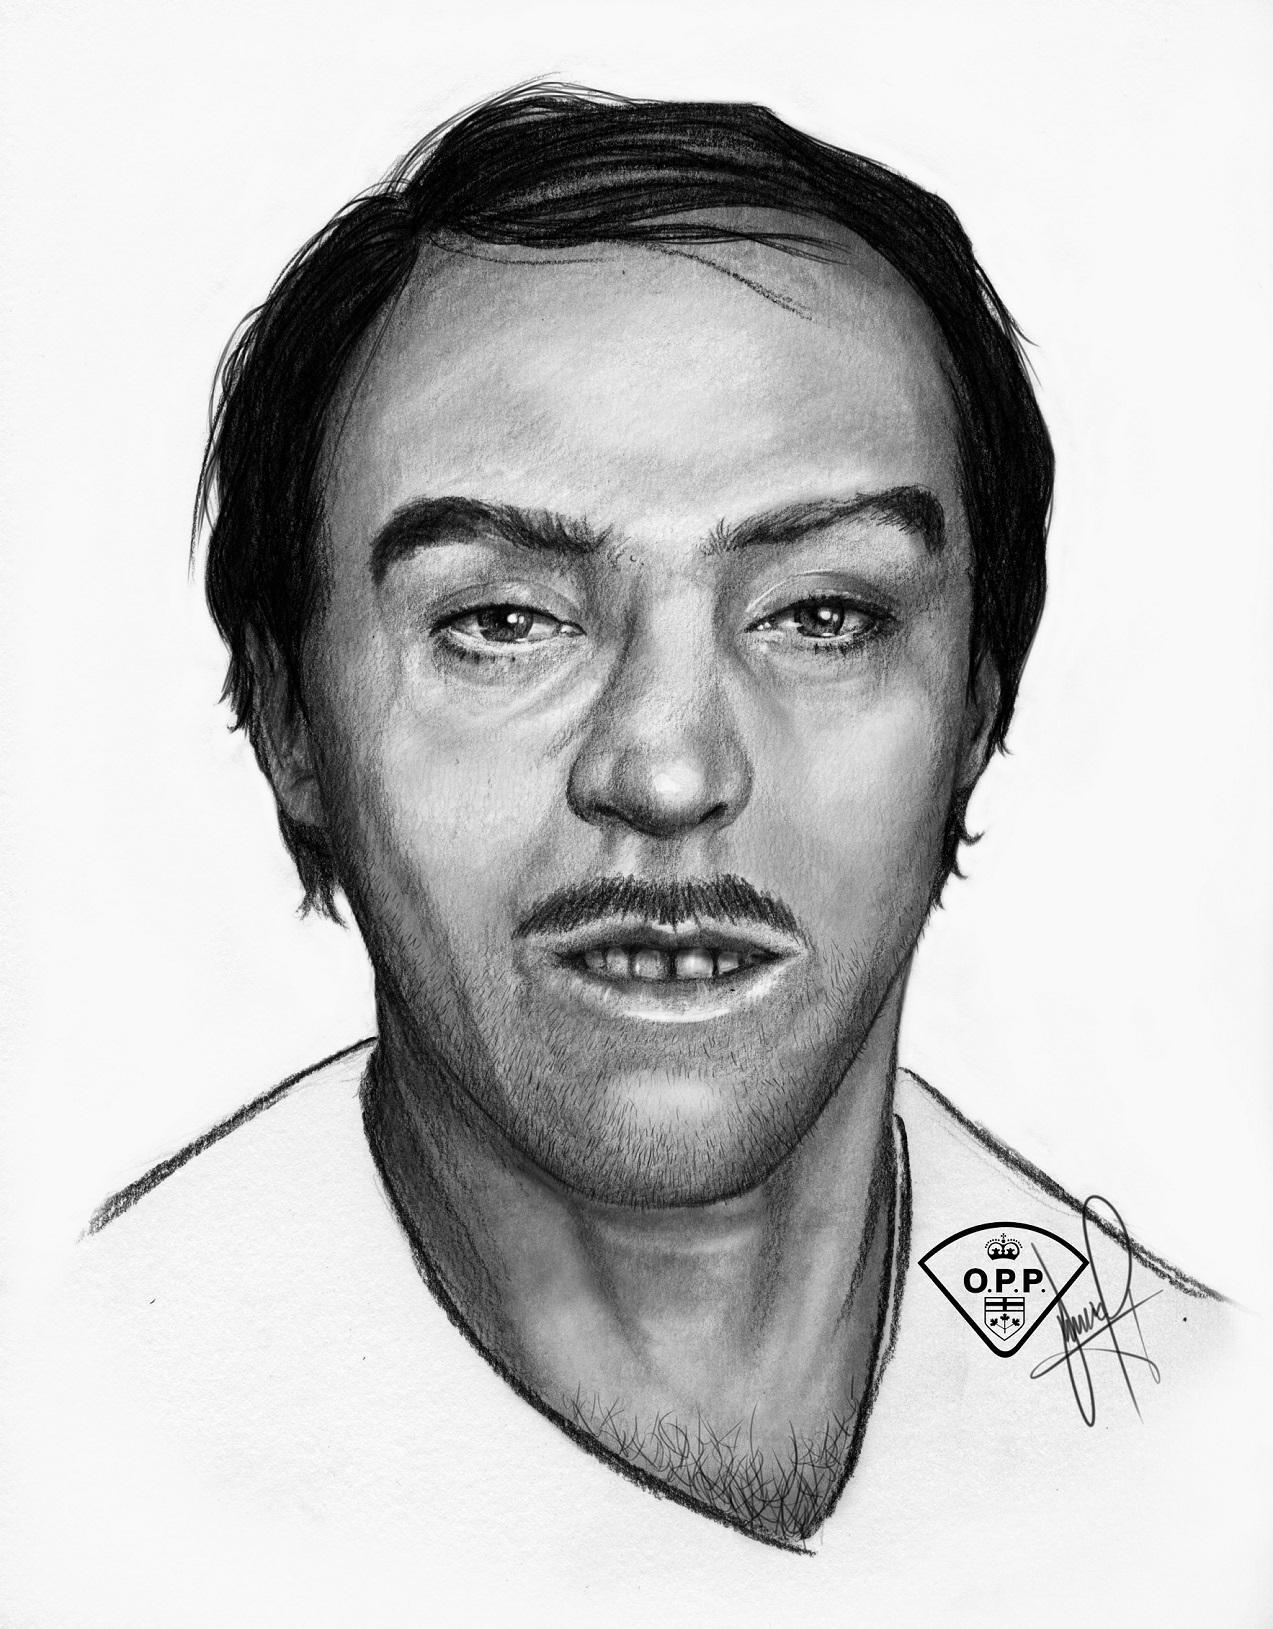 Toronto John Doe (2000)